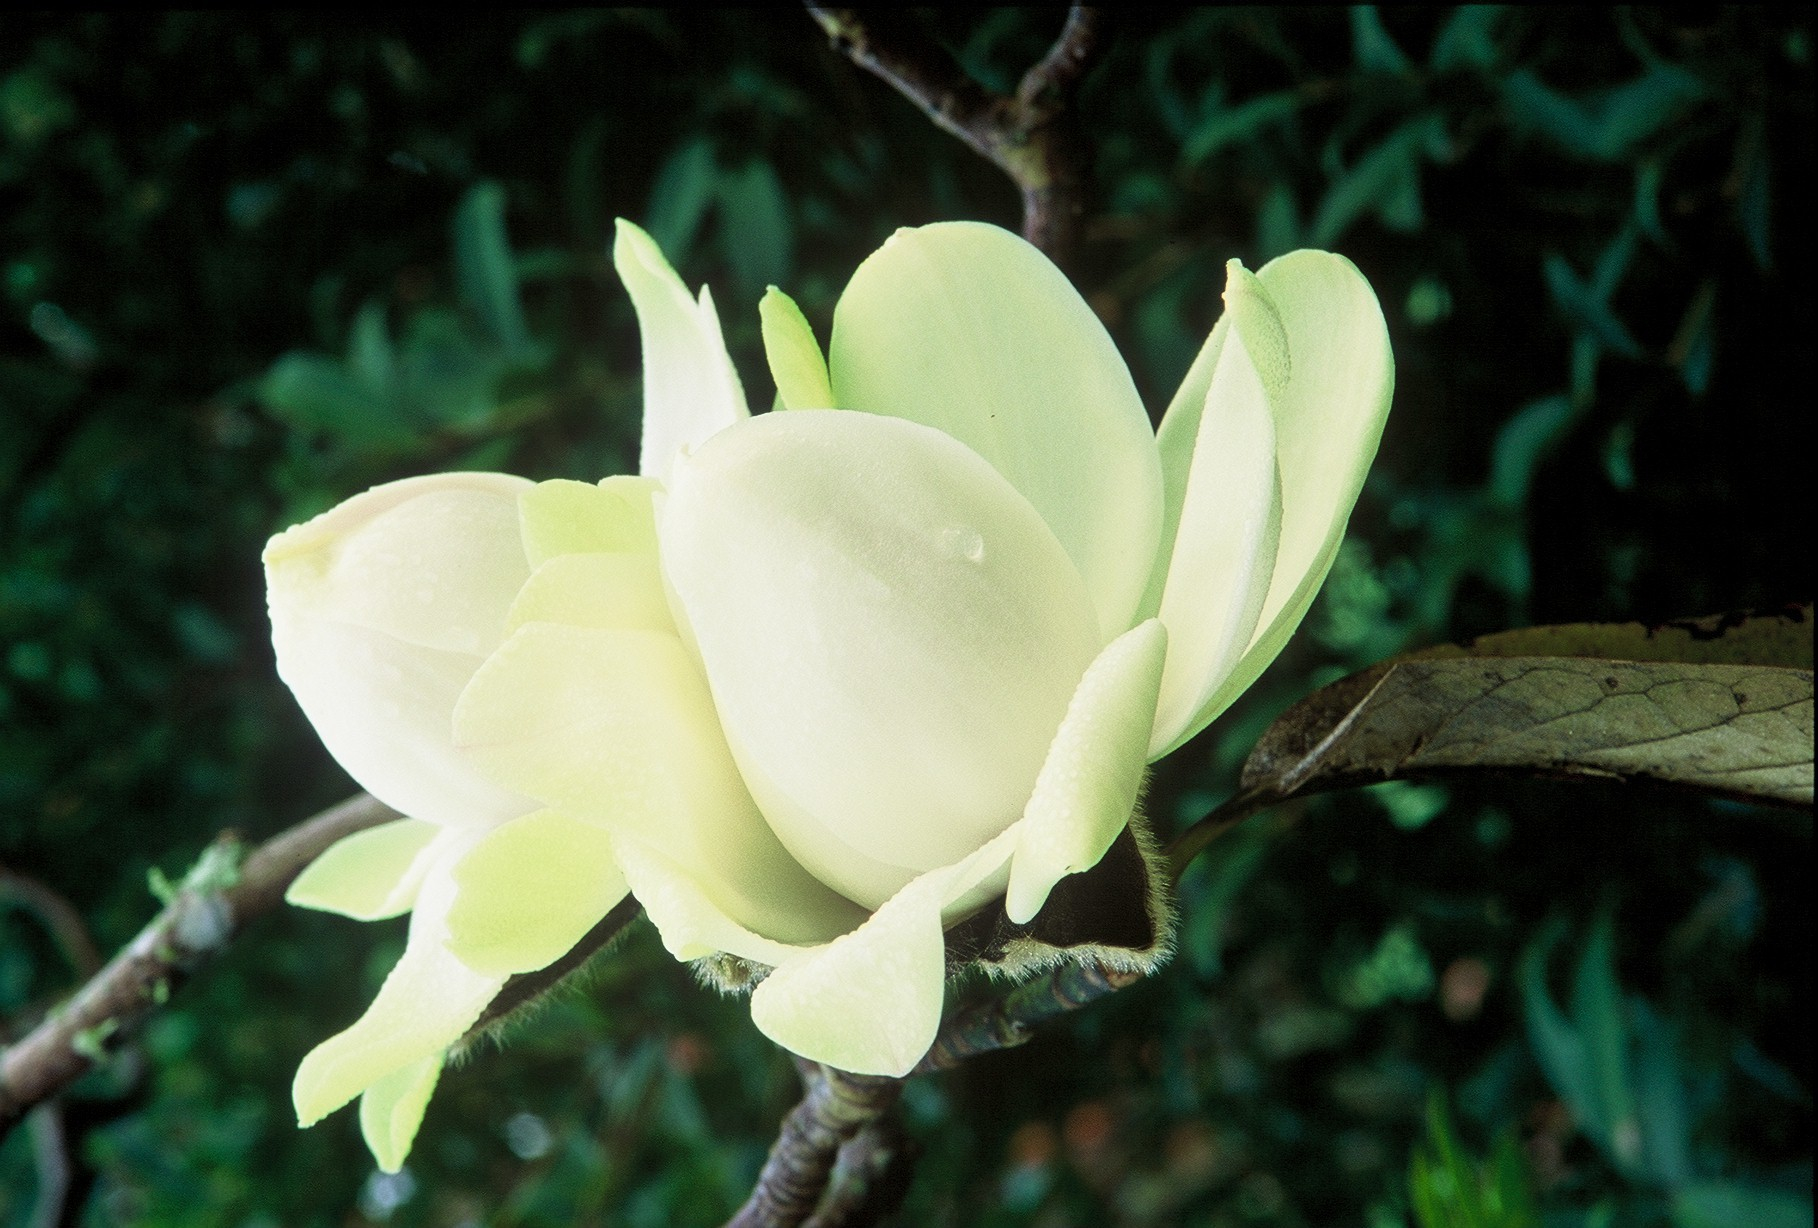 Magnolia Garden Auckland Botanic Gardens